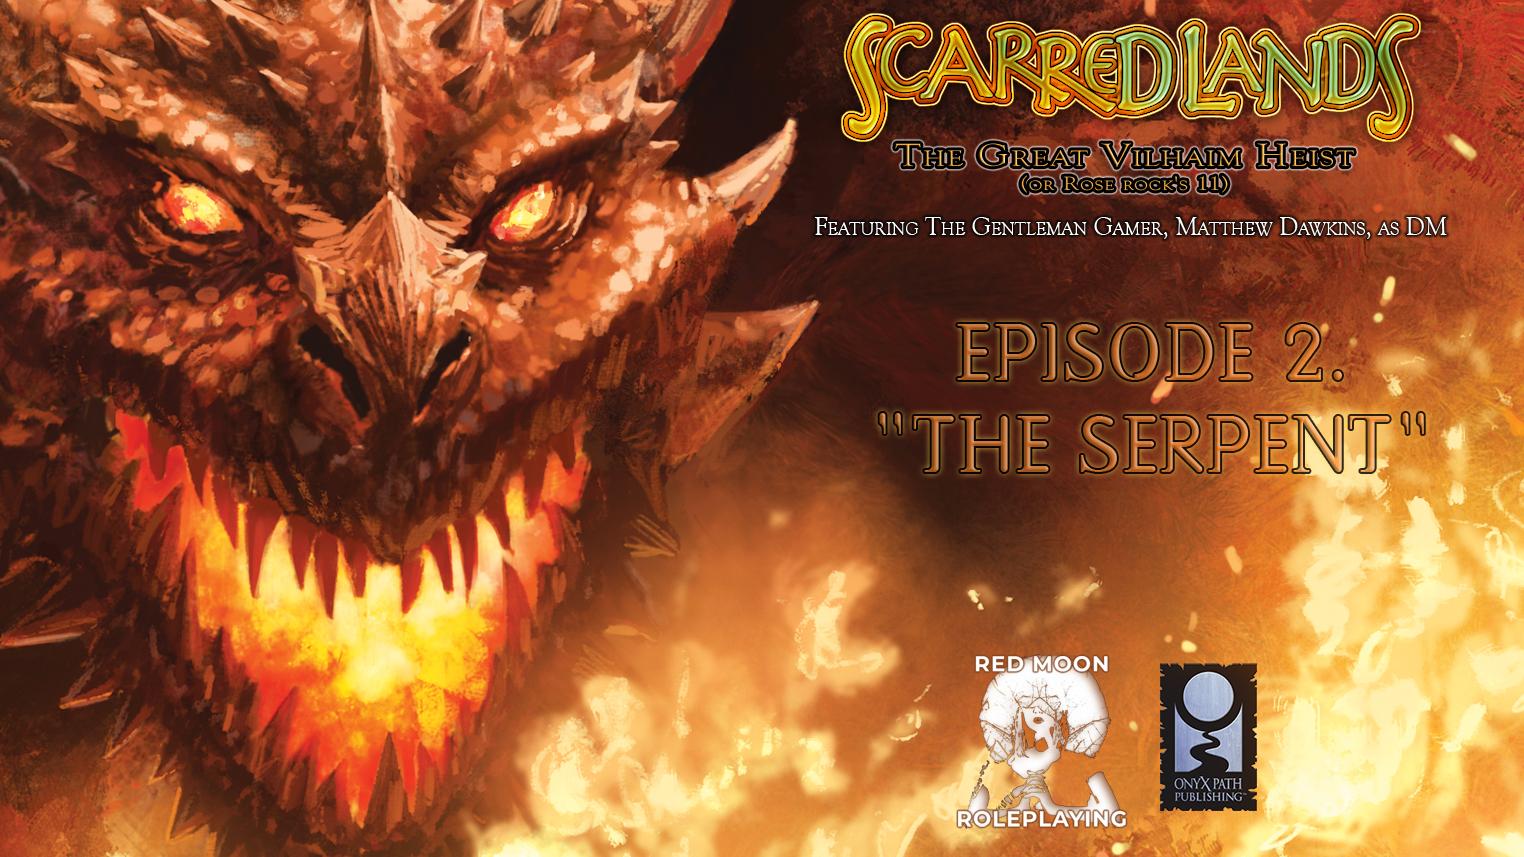 SCARRED_02.jpg